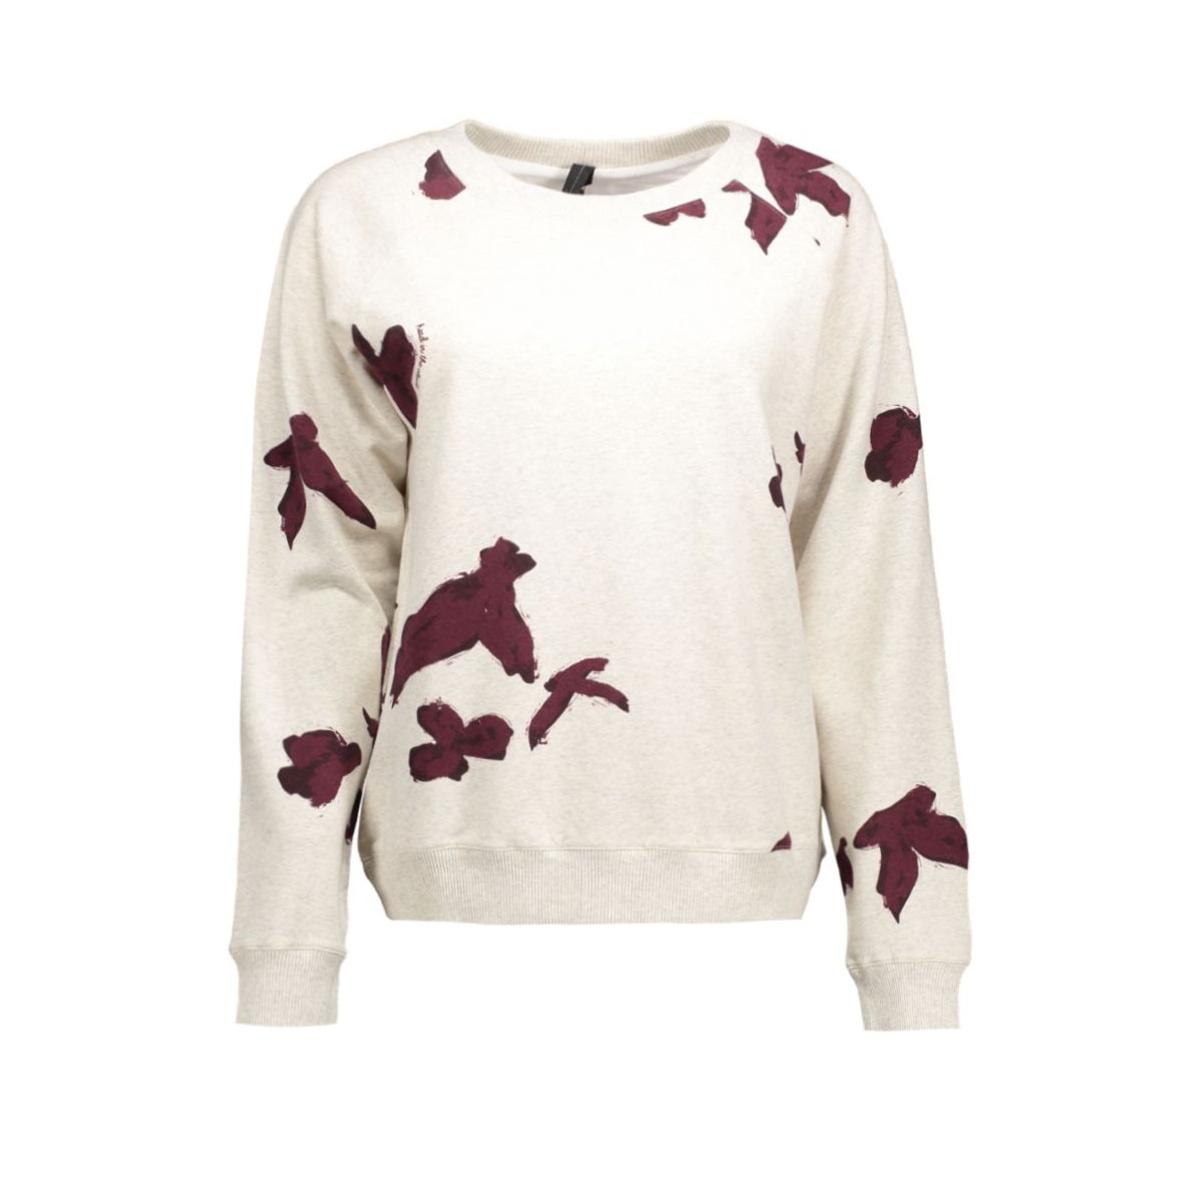 16wi805 10 days sweater soft white